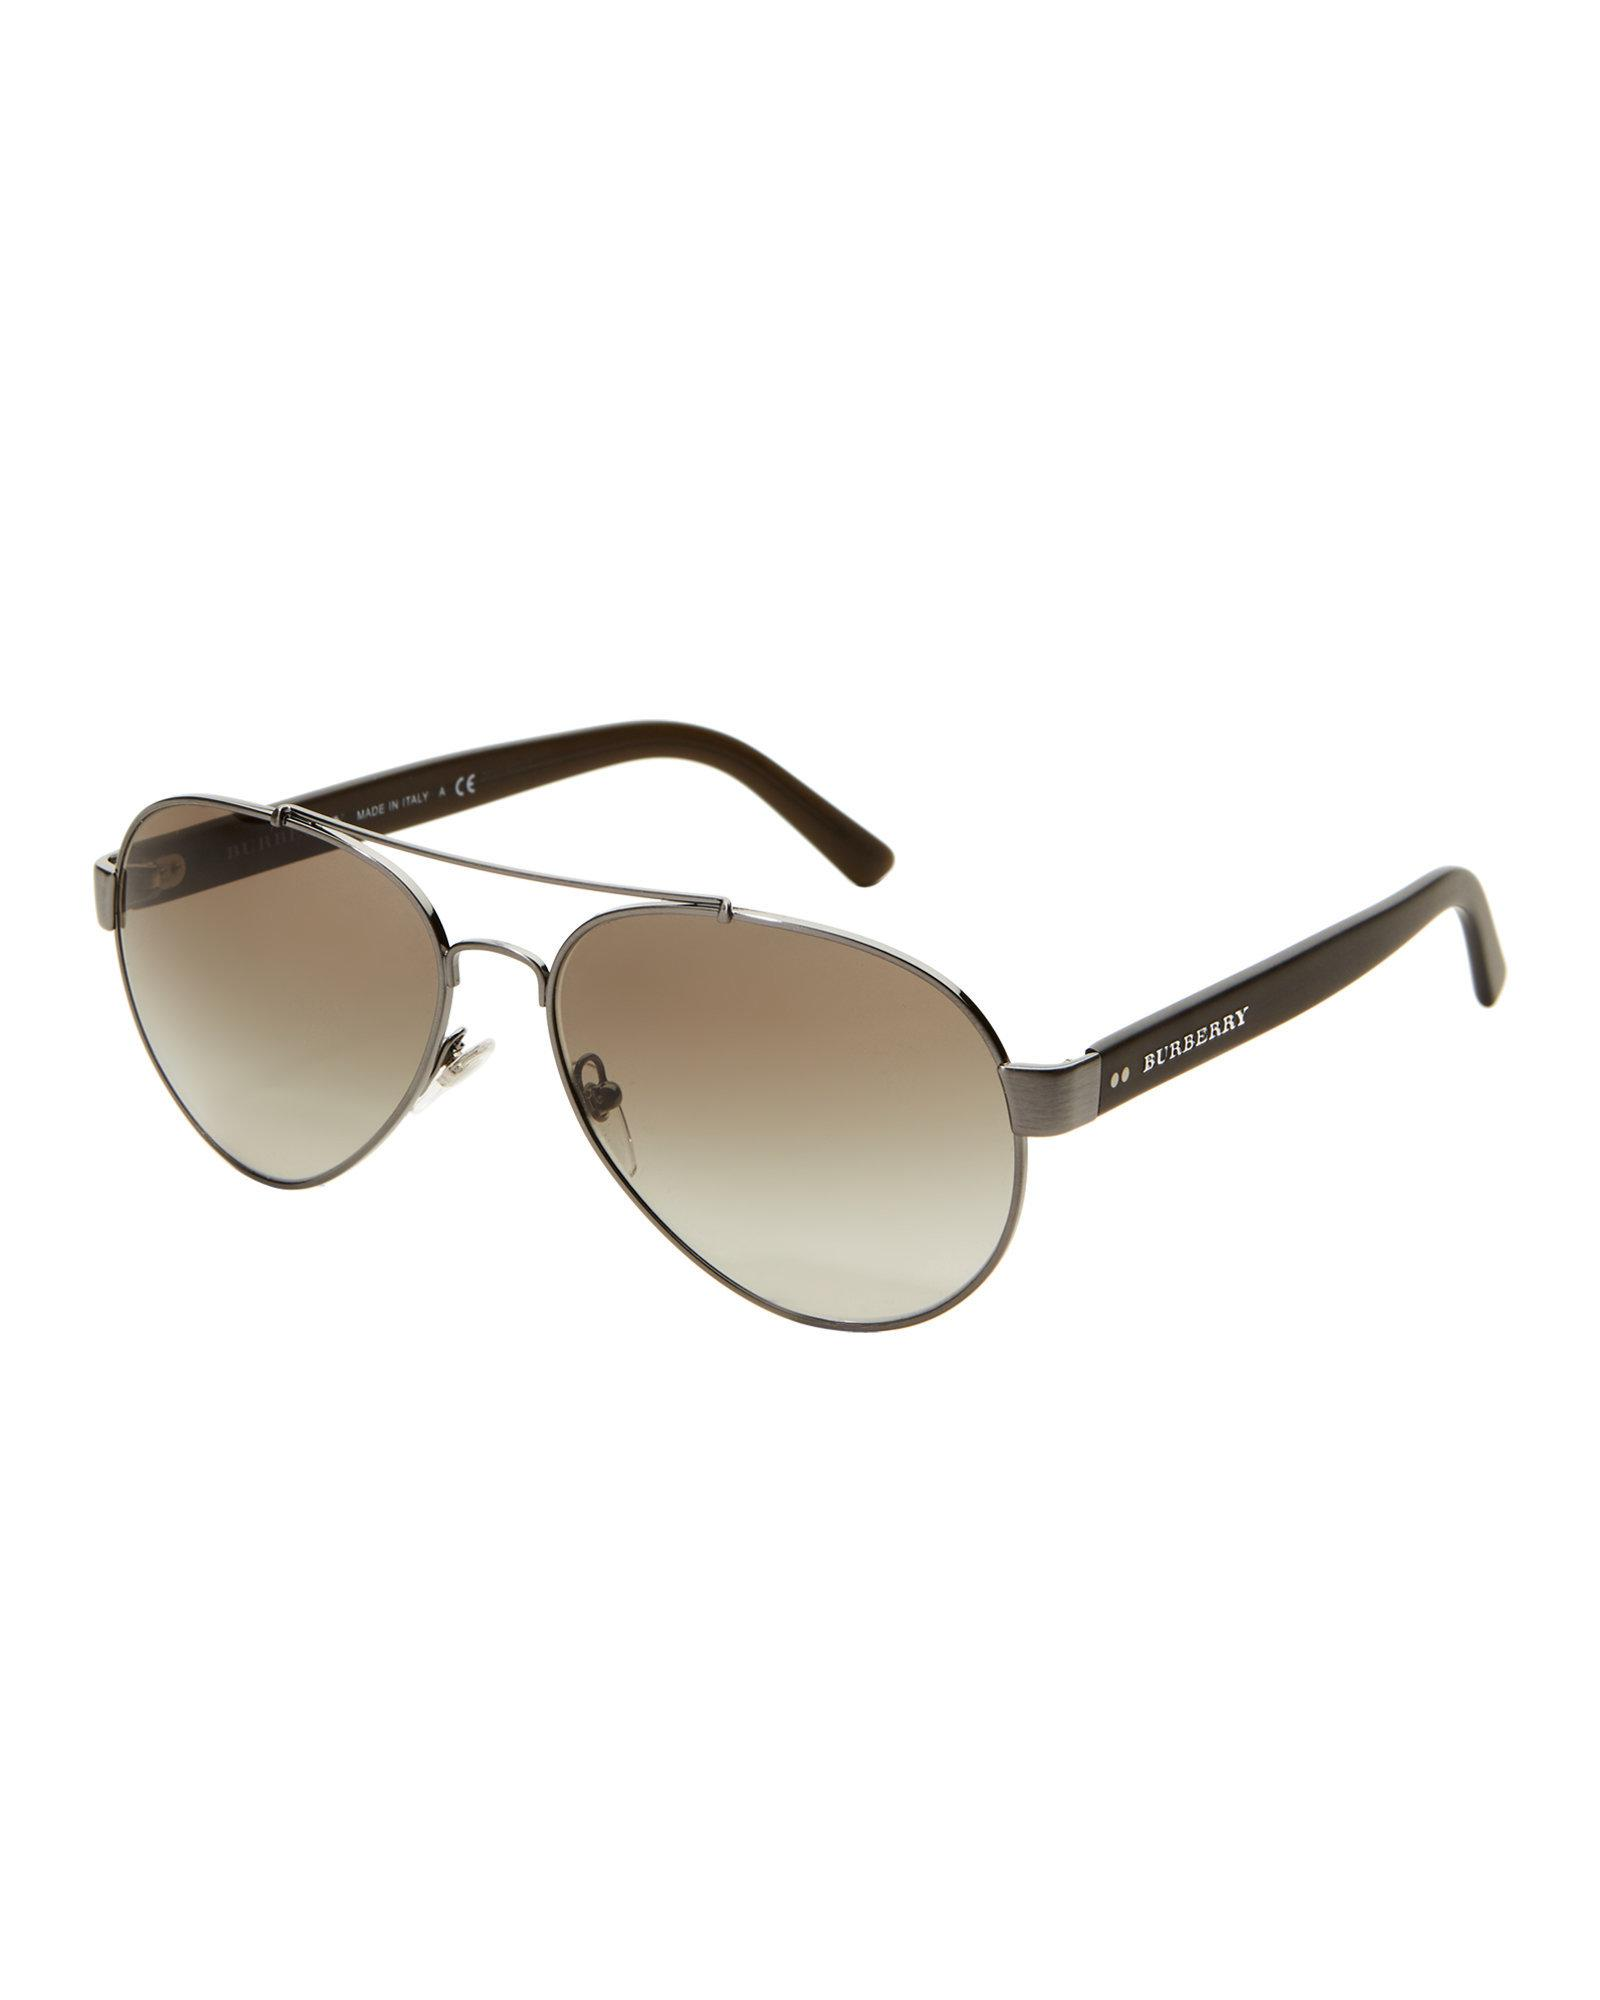 053083fe92f2 Lyst - Burberry Be3086 Gunmetal Aviator Sunglasses